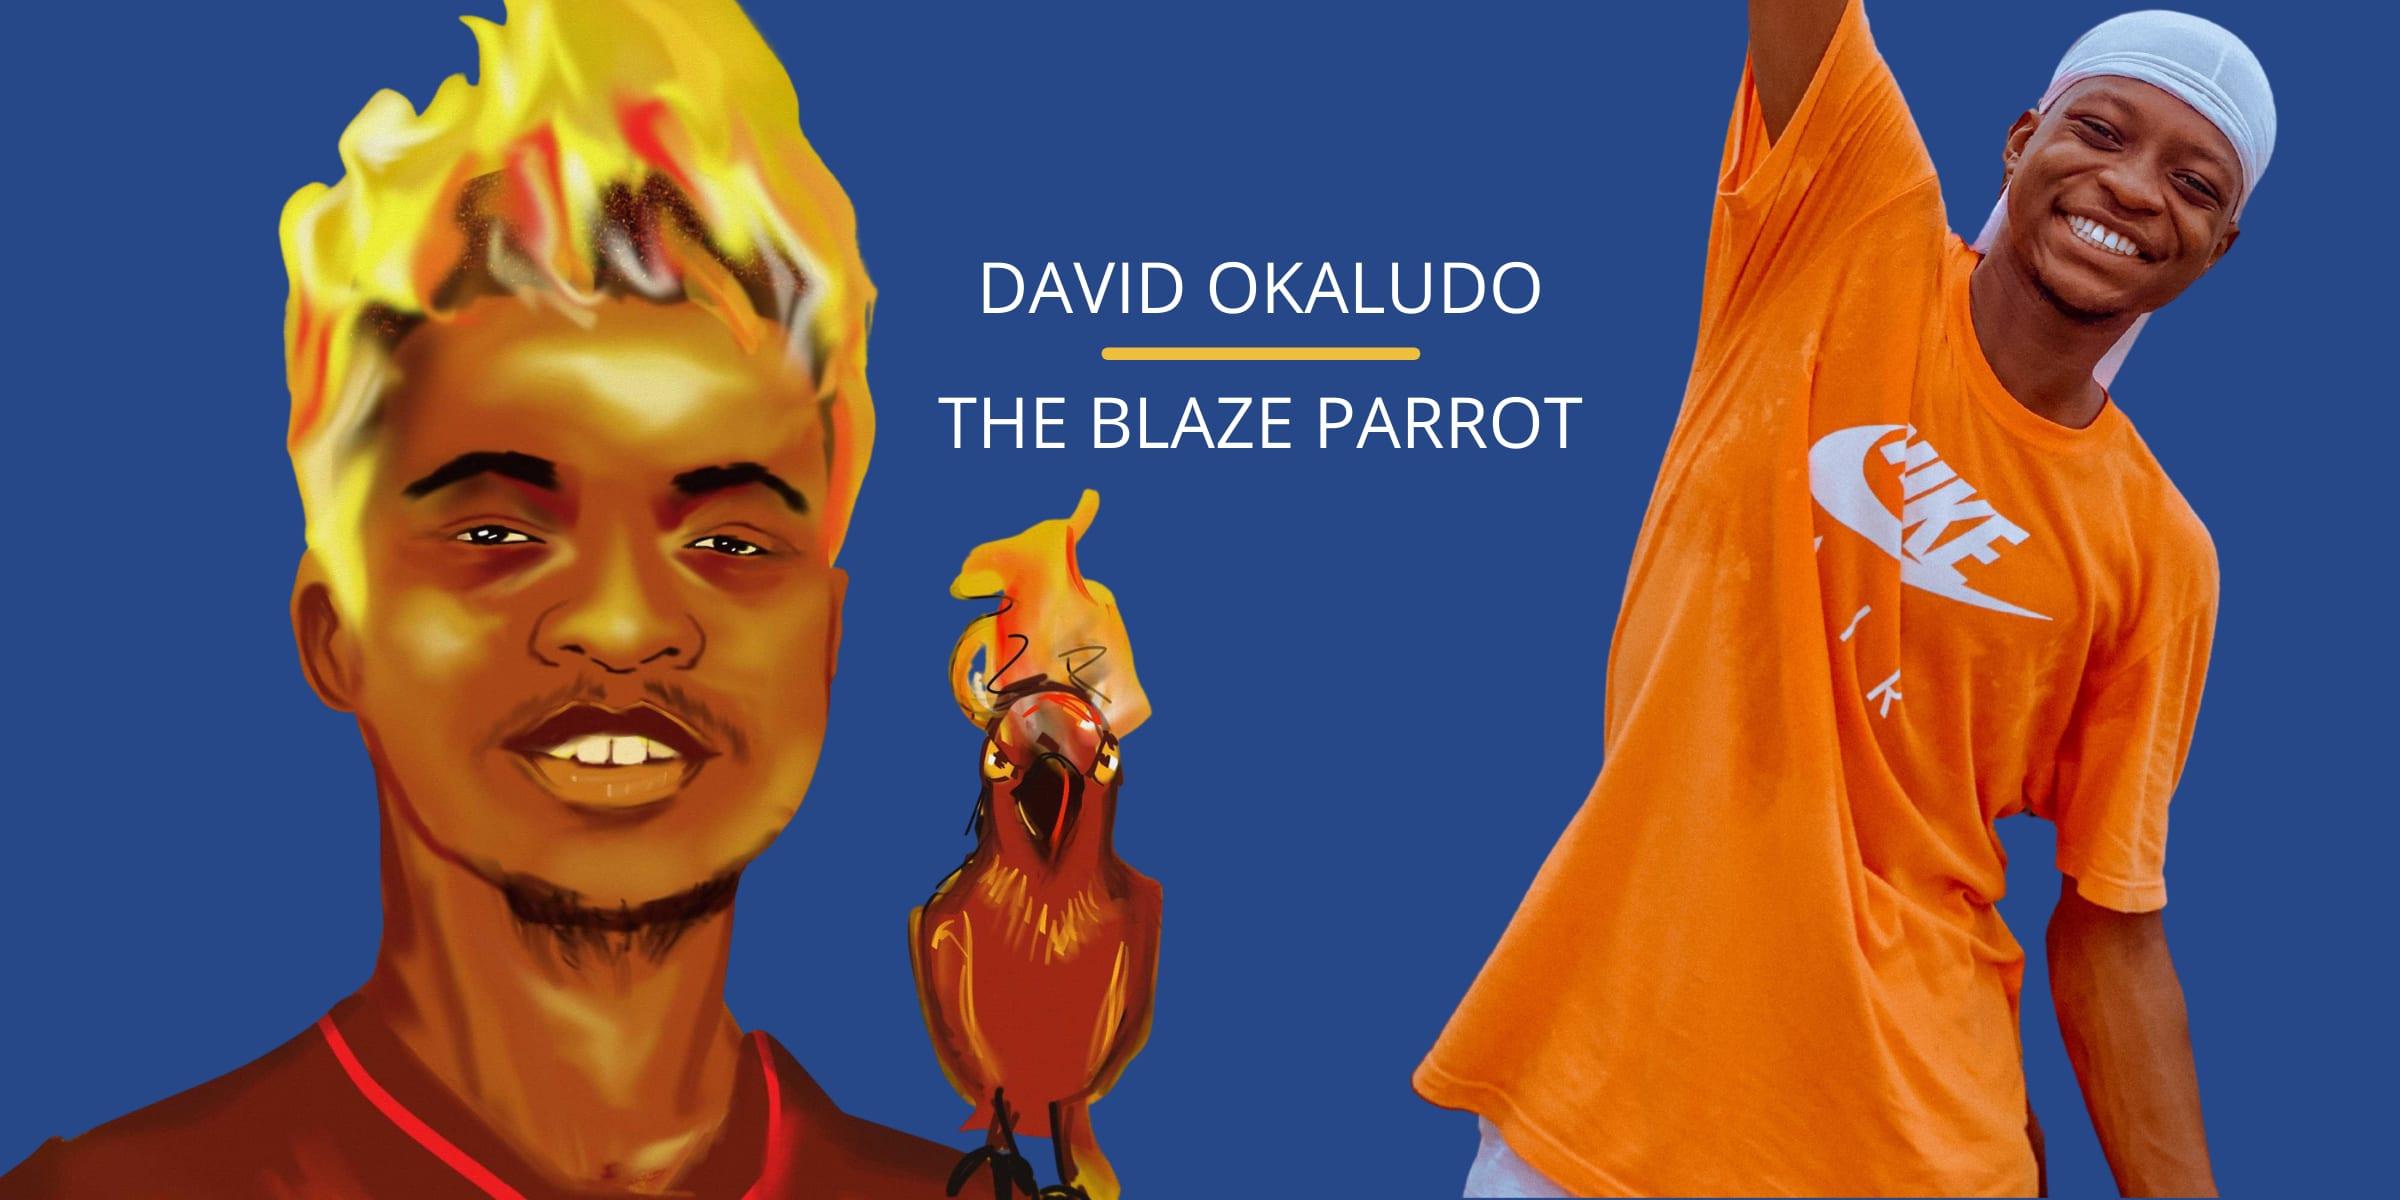 Blaze Parrot